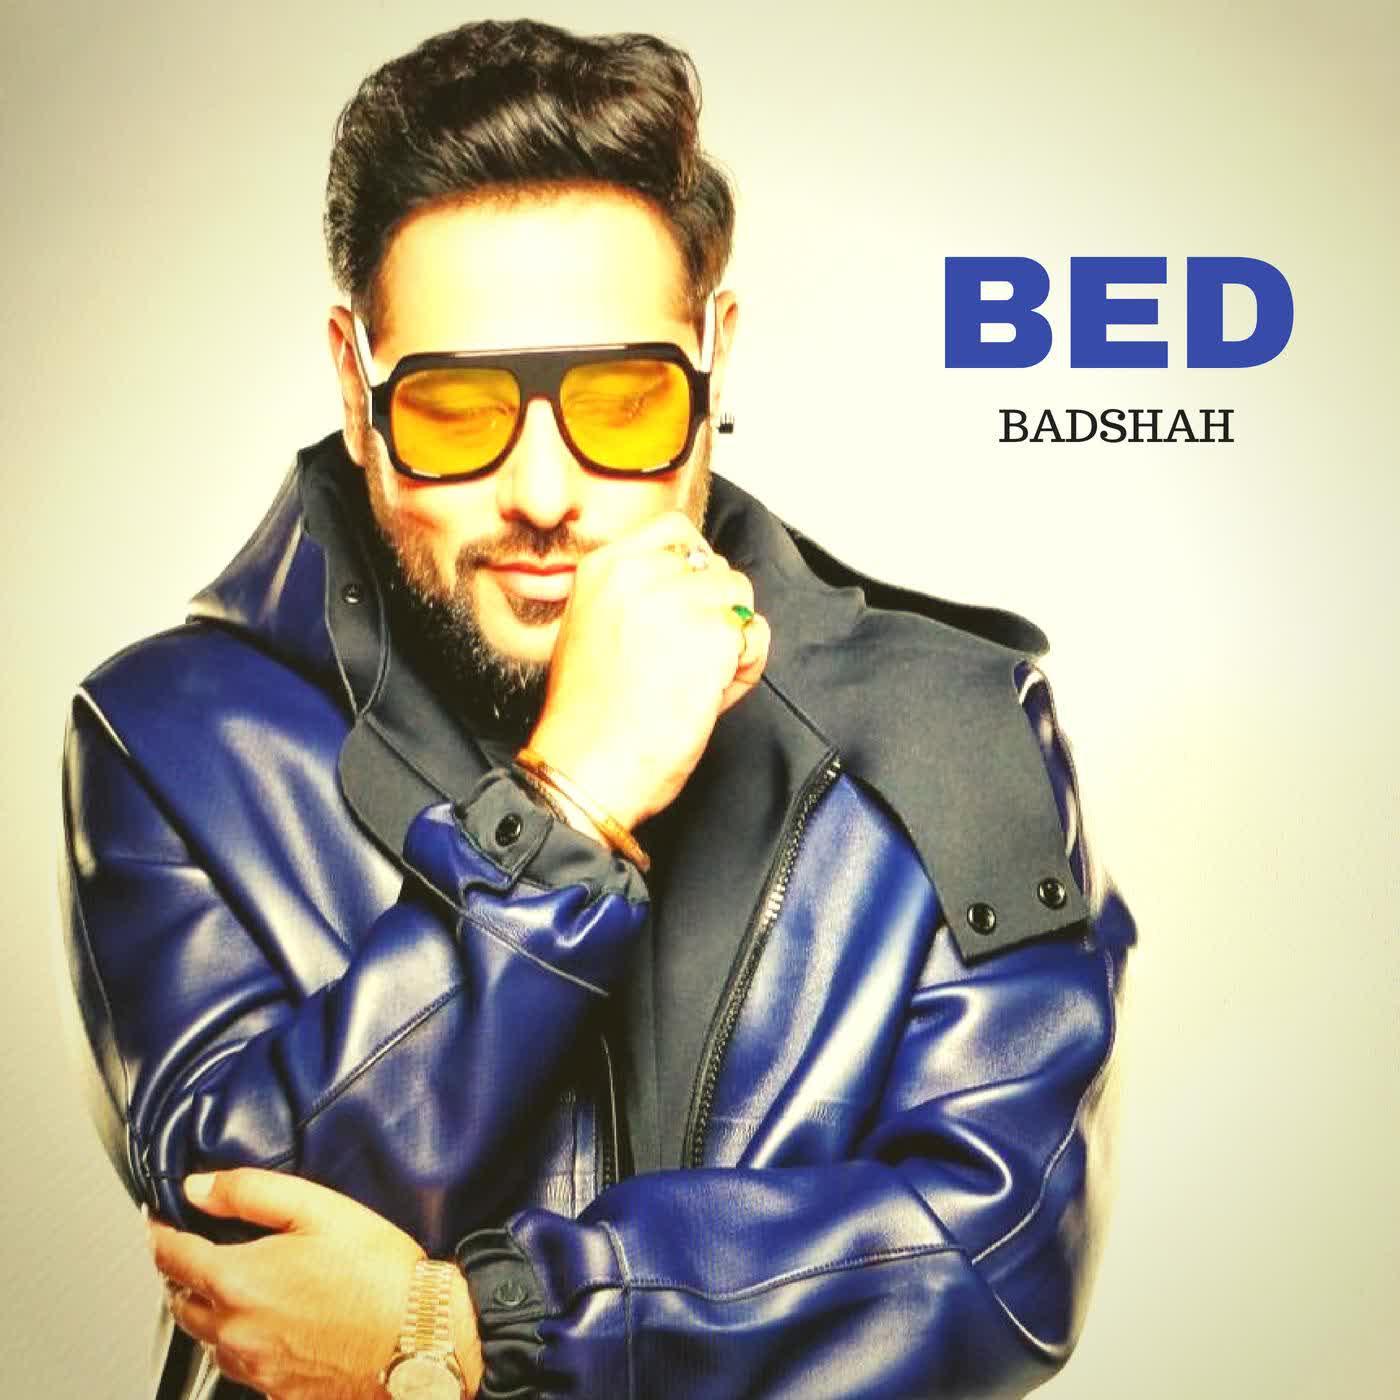 https://cover.djpunjab.org/42901/300x250/Bed_Badshah.jpg